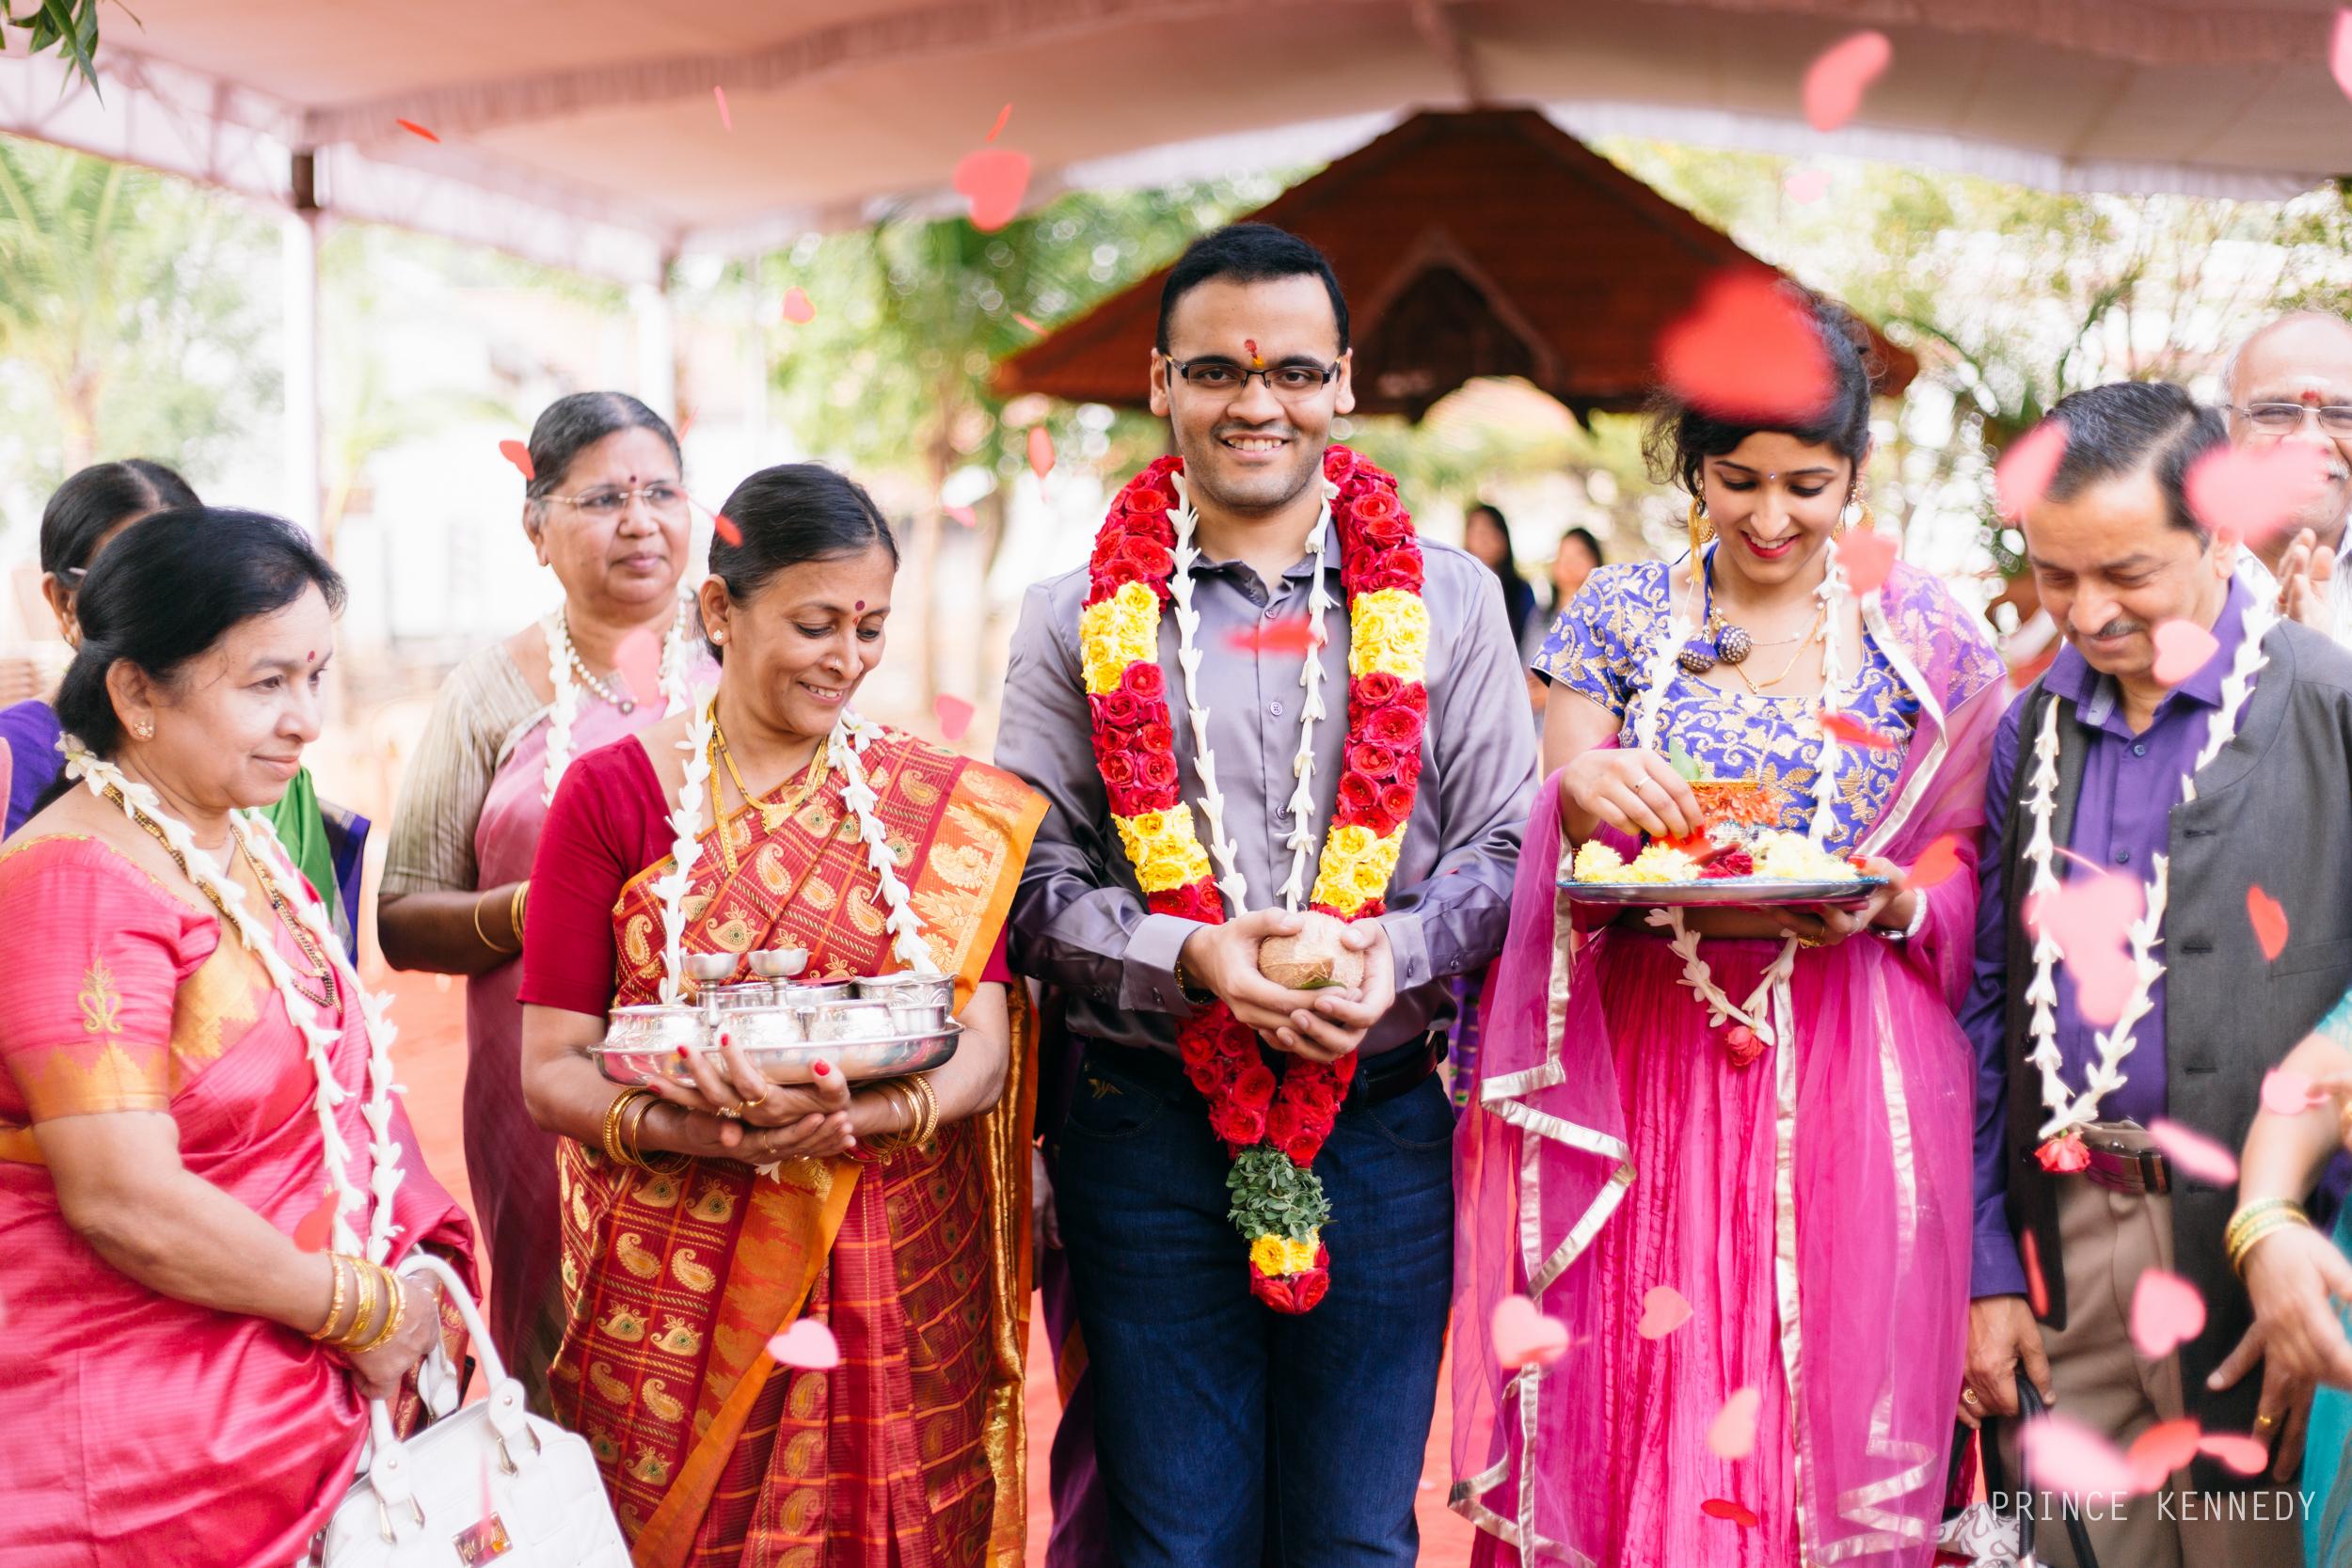 Athmajja-Nithesh-Engagement-Couple-Portrait-Portraiture-Wedding-Couple-Portrait-Chennai-Photographer-Candid-Photography-Destination-Best-Prince-Kennedy-Photography-95.jpg